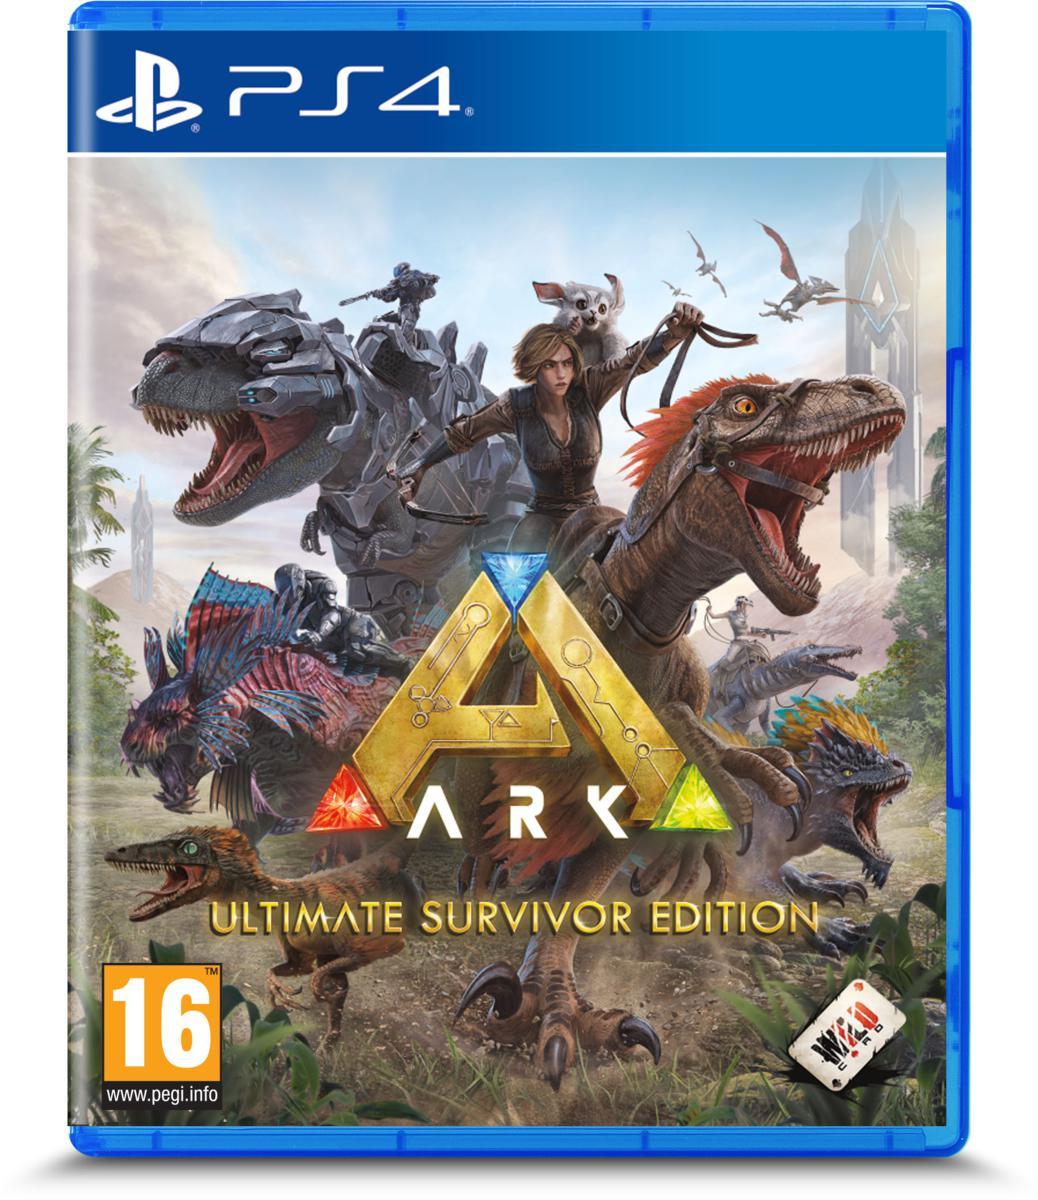 Solutions 2 Go PS4 ARK: Ultimate Survivor Edition